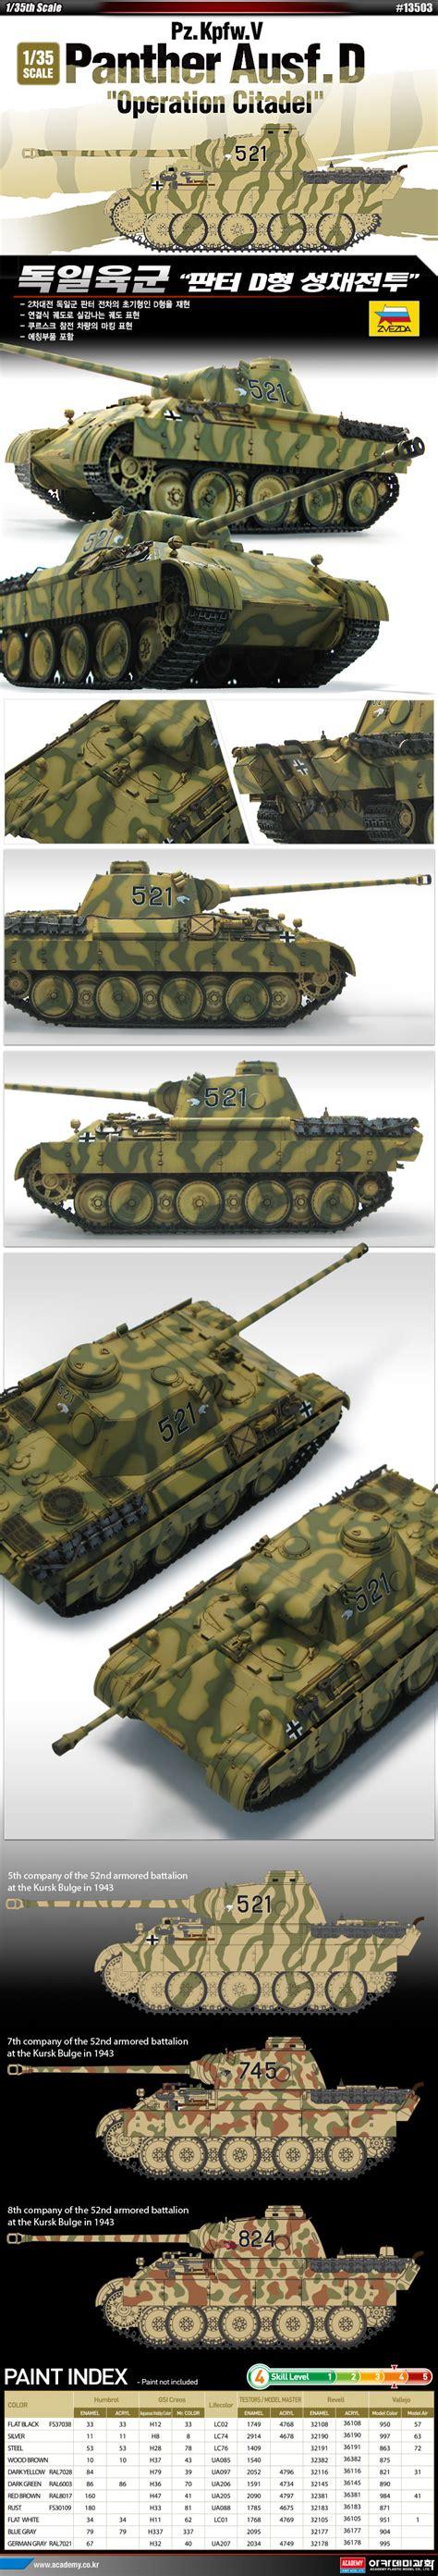 Academy 13313 1 35 Plastic Model Kit Pz Bef Wg 35 T German Command T academy 1 35 plastic model kit pz kpfw v panther ausf d operation citadel 13503 ebay